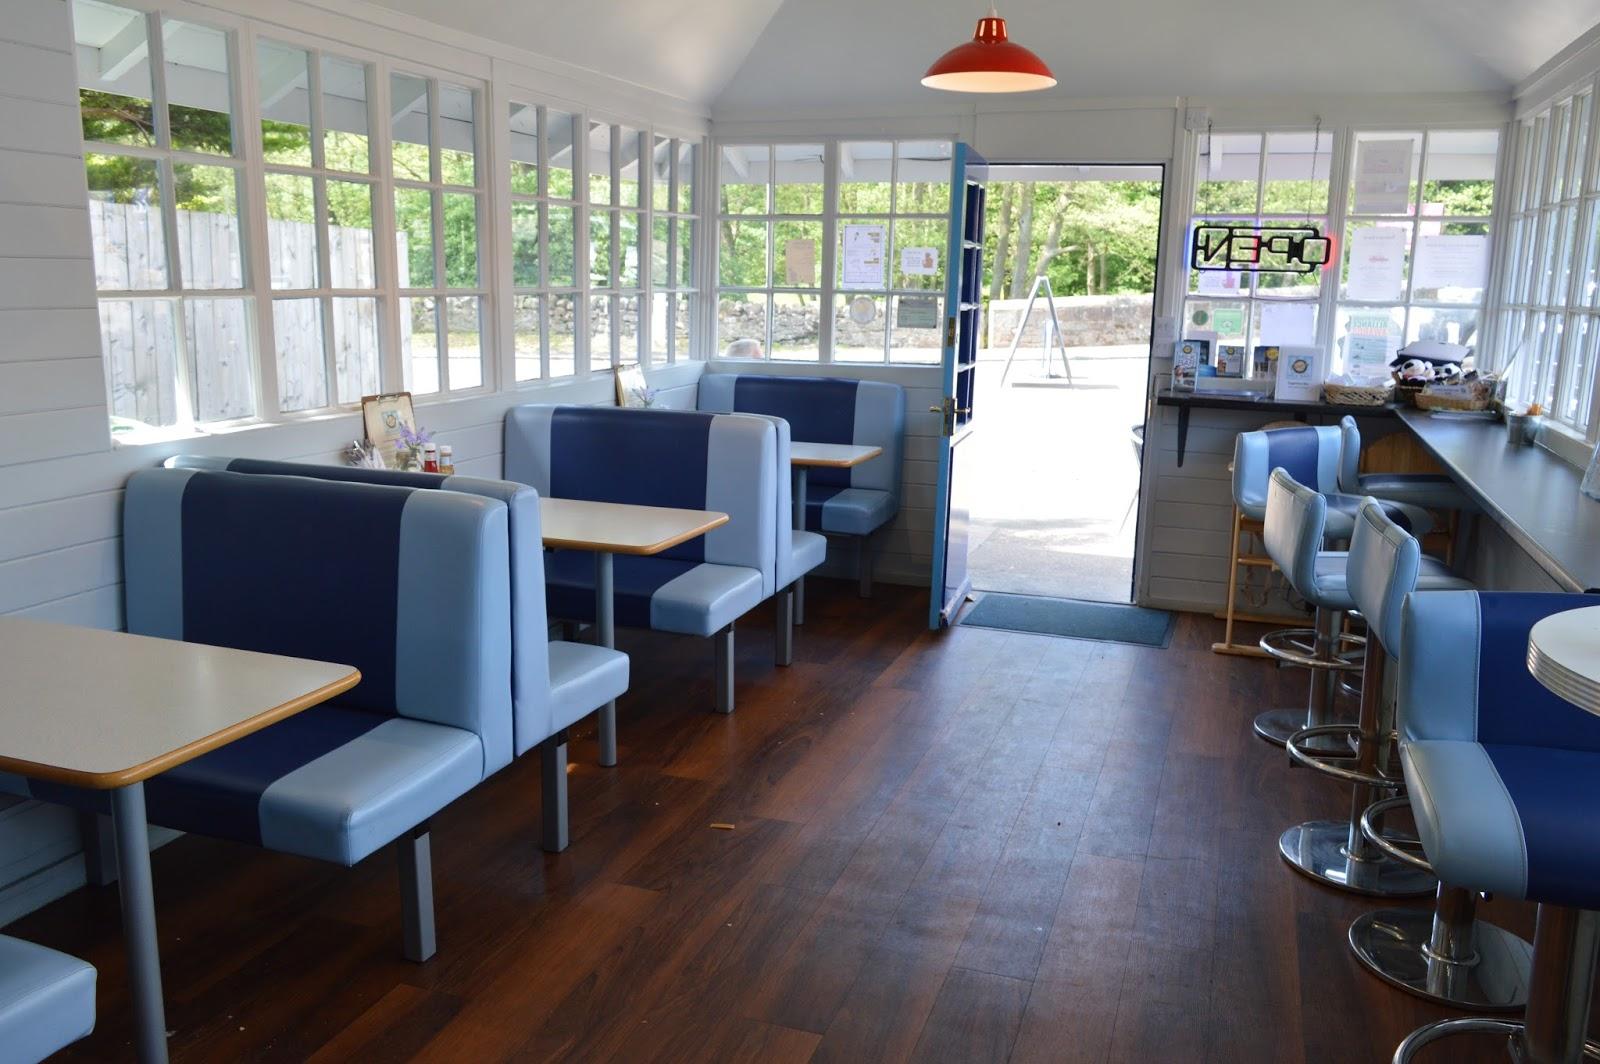 The Doddington Dairy Milk Bar Wooler | Award Winning Ice Cream & treats near the A697 in Northumberland